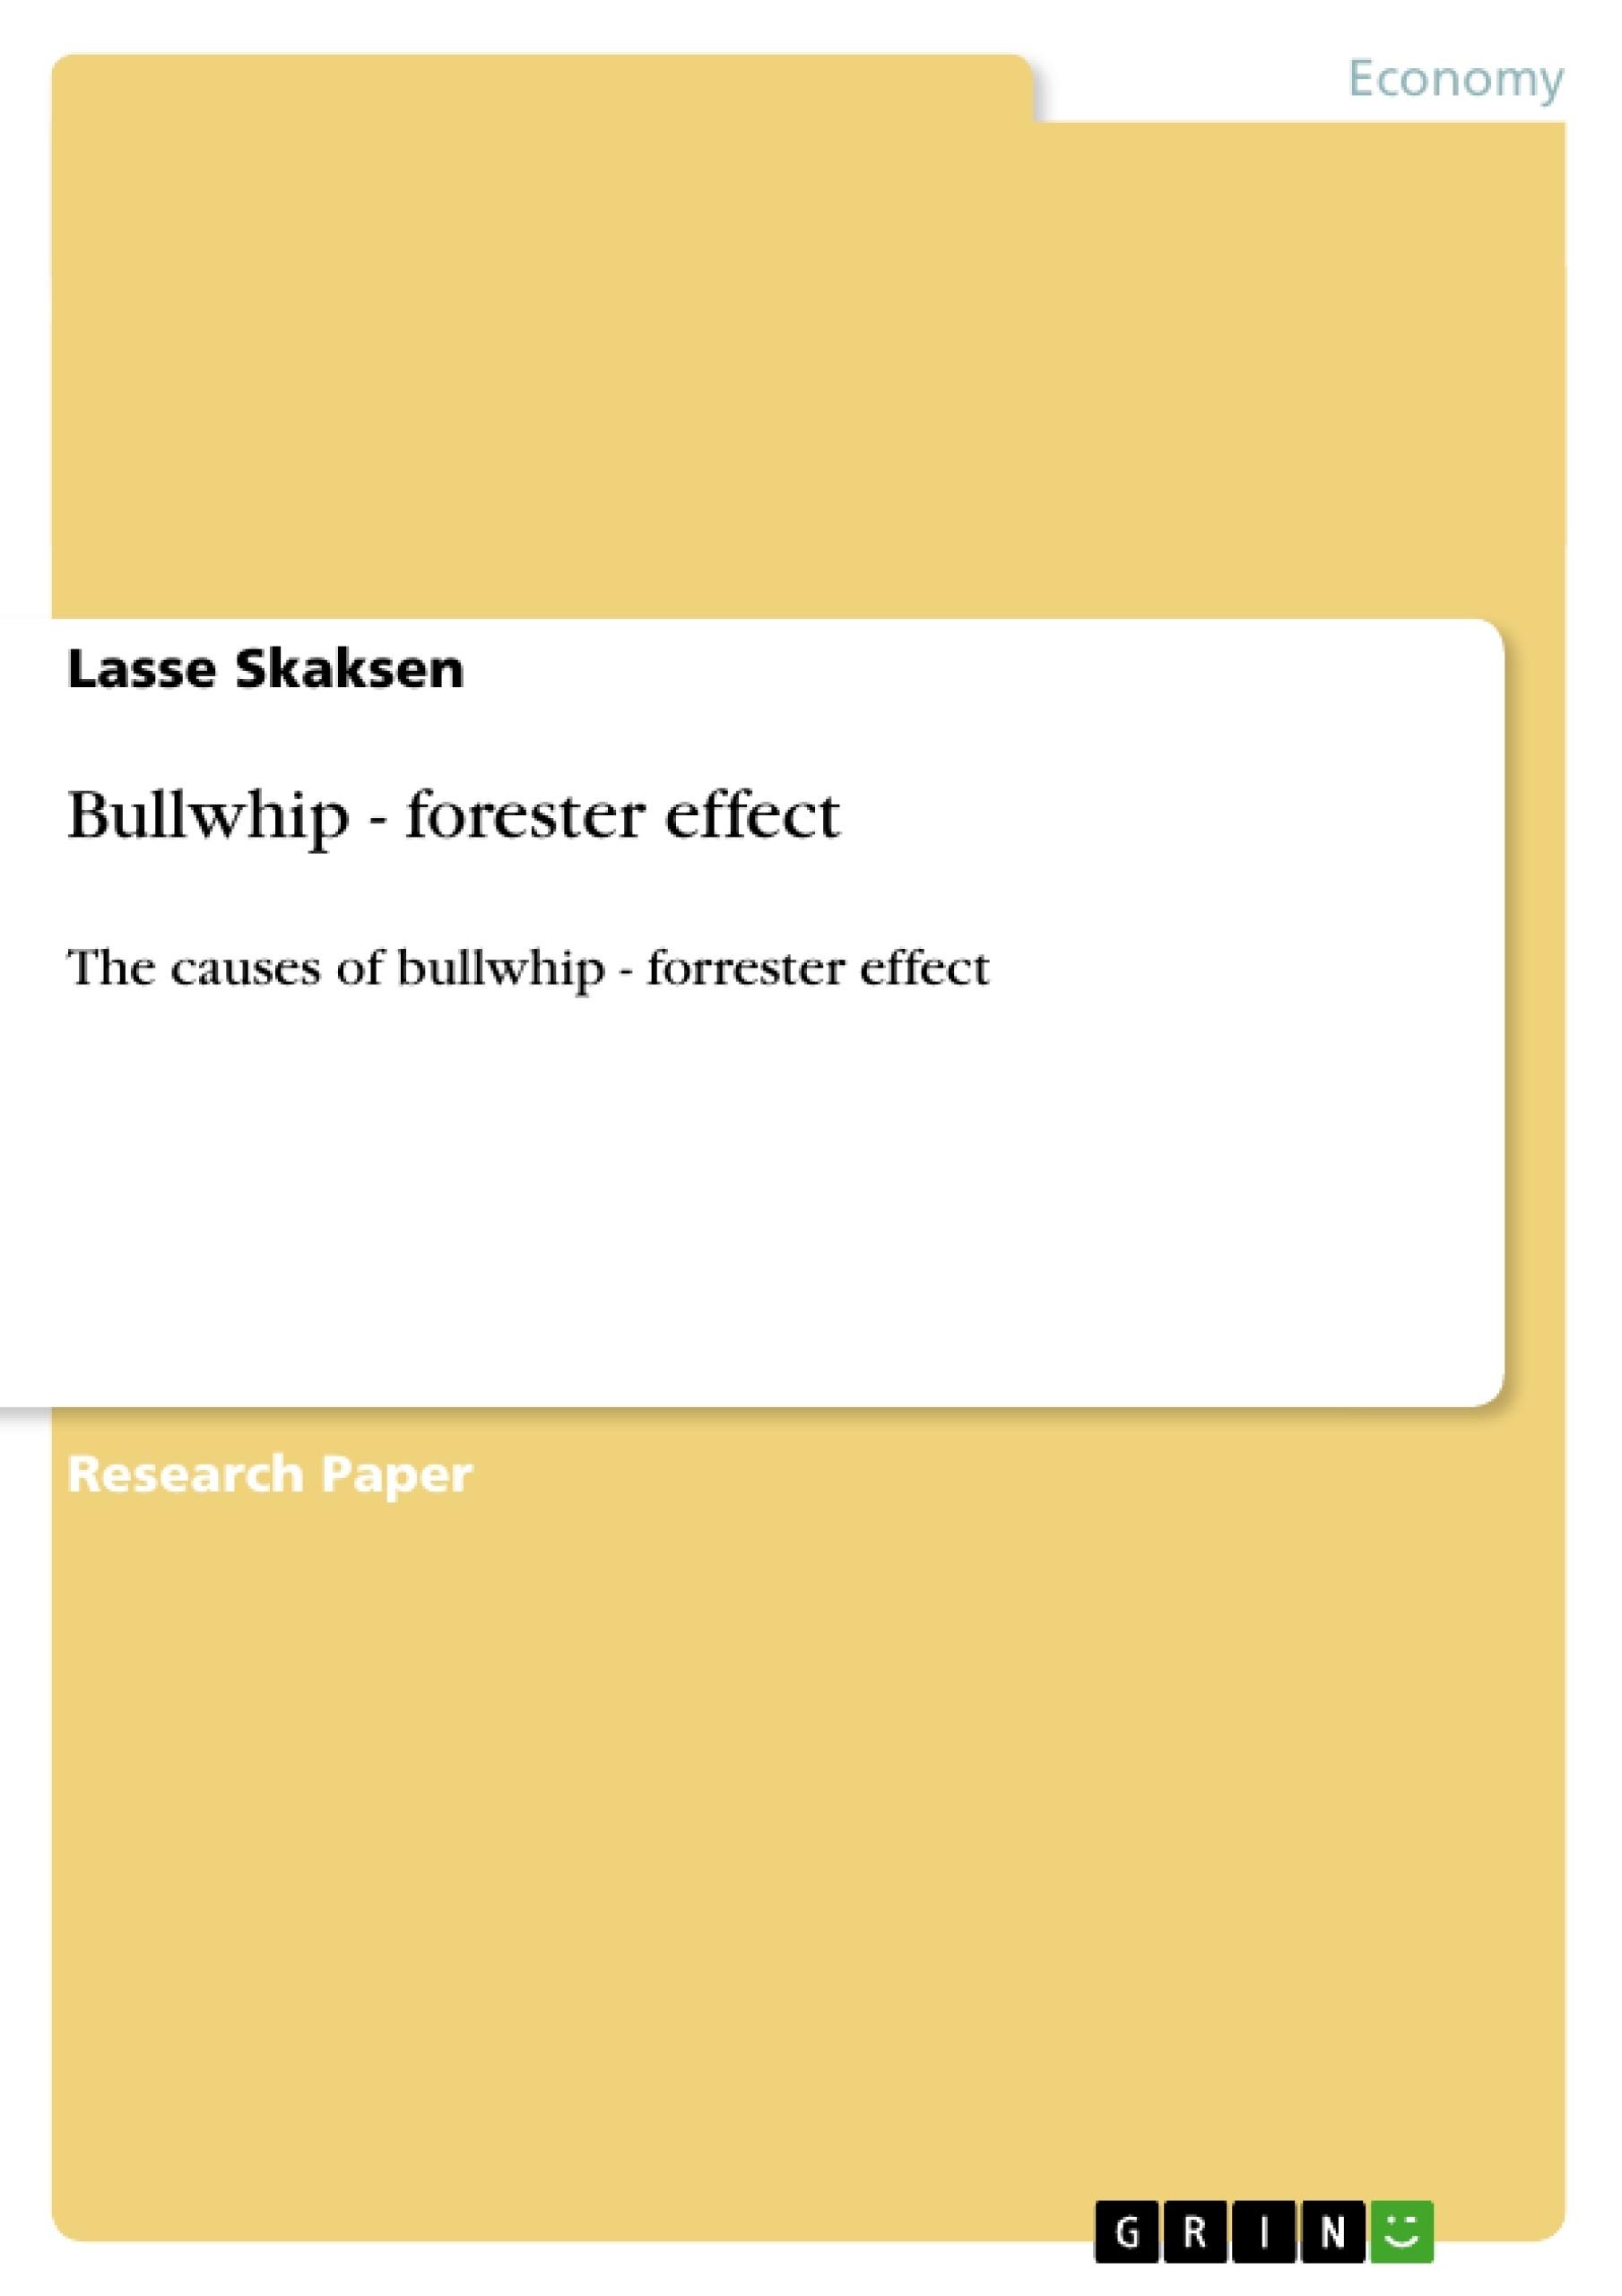 Title: Bullwhip - forester effect